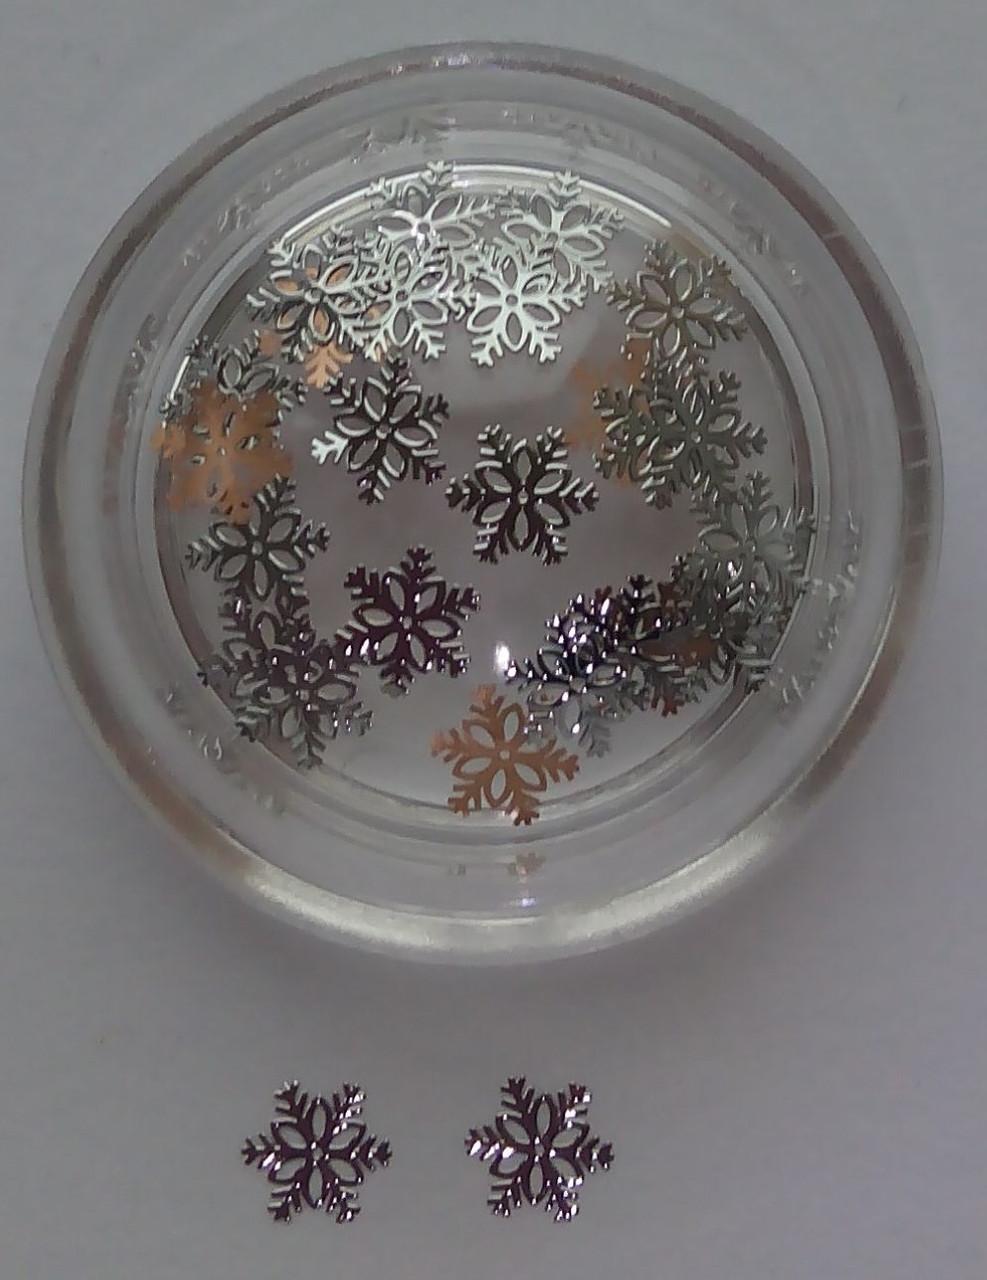 Снежинки,  металлические логотипы снежинки (серебро)